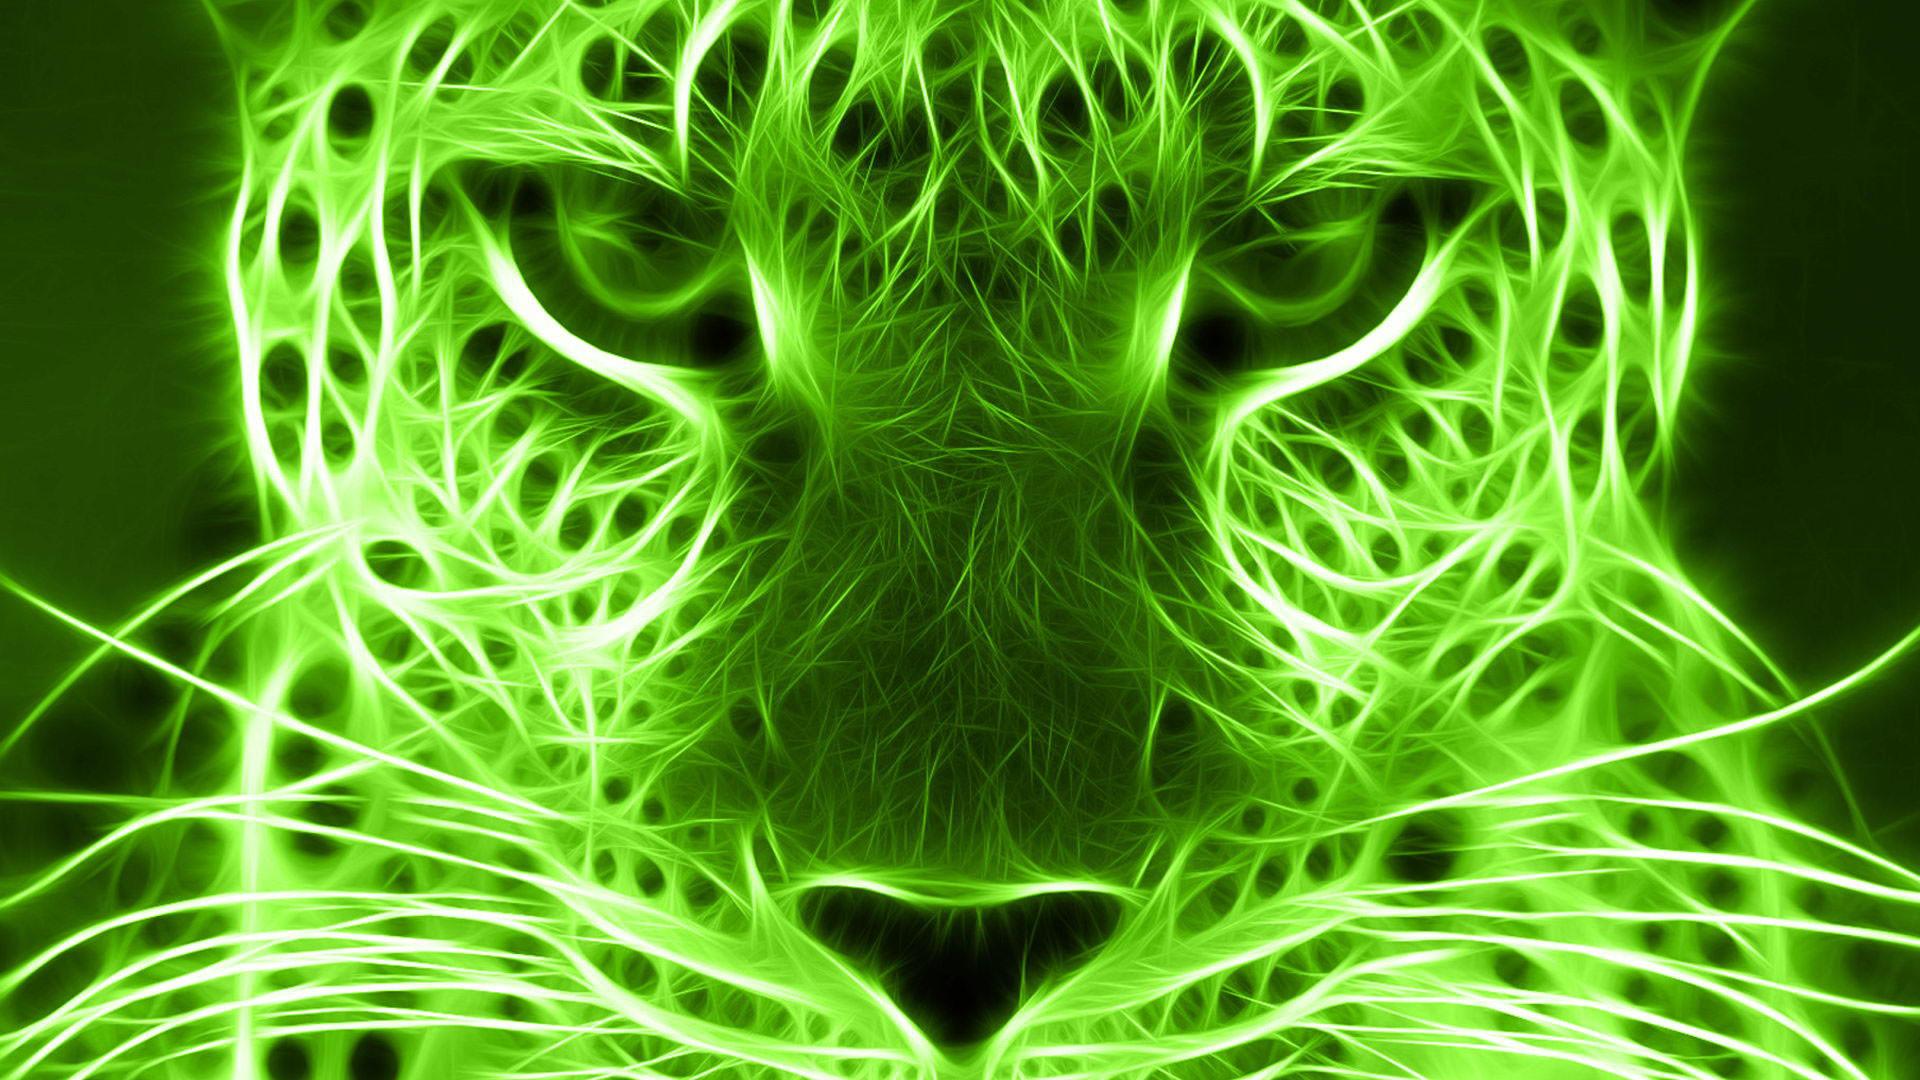 hd pics photos green animals digital art neon desktop background wallpaper